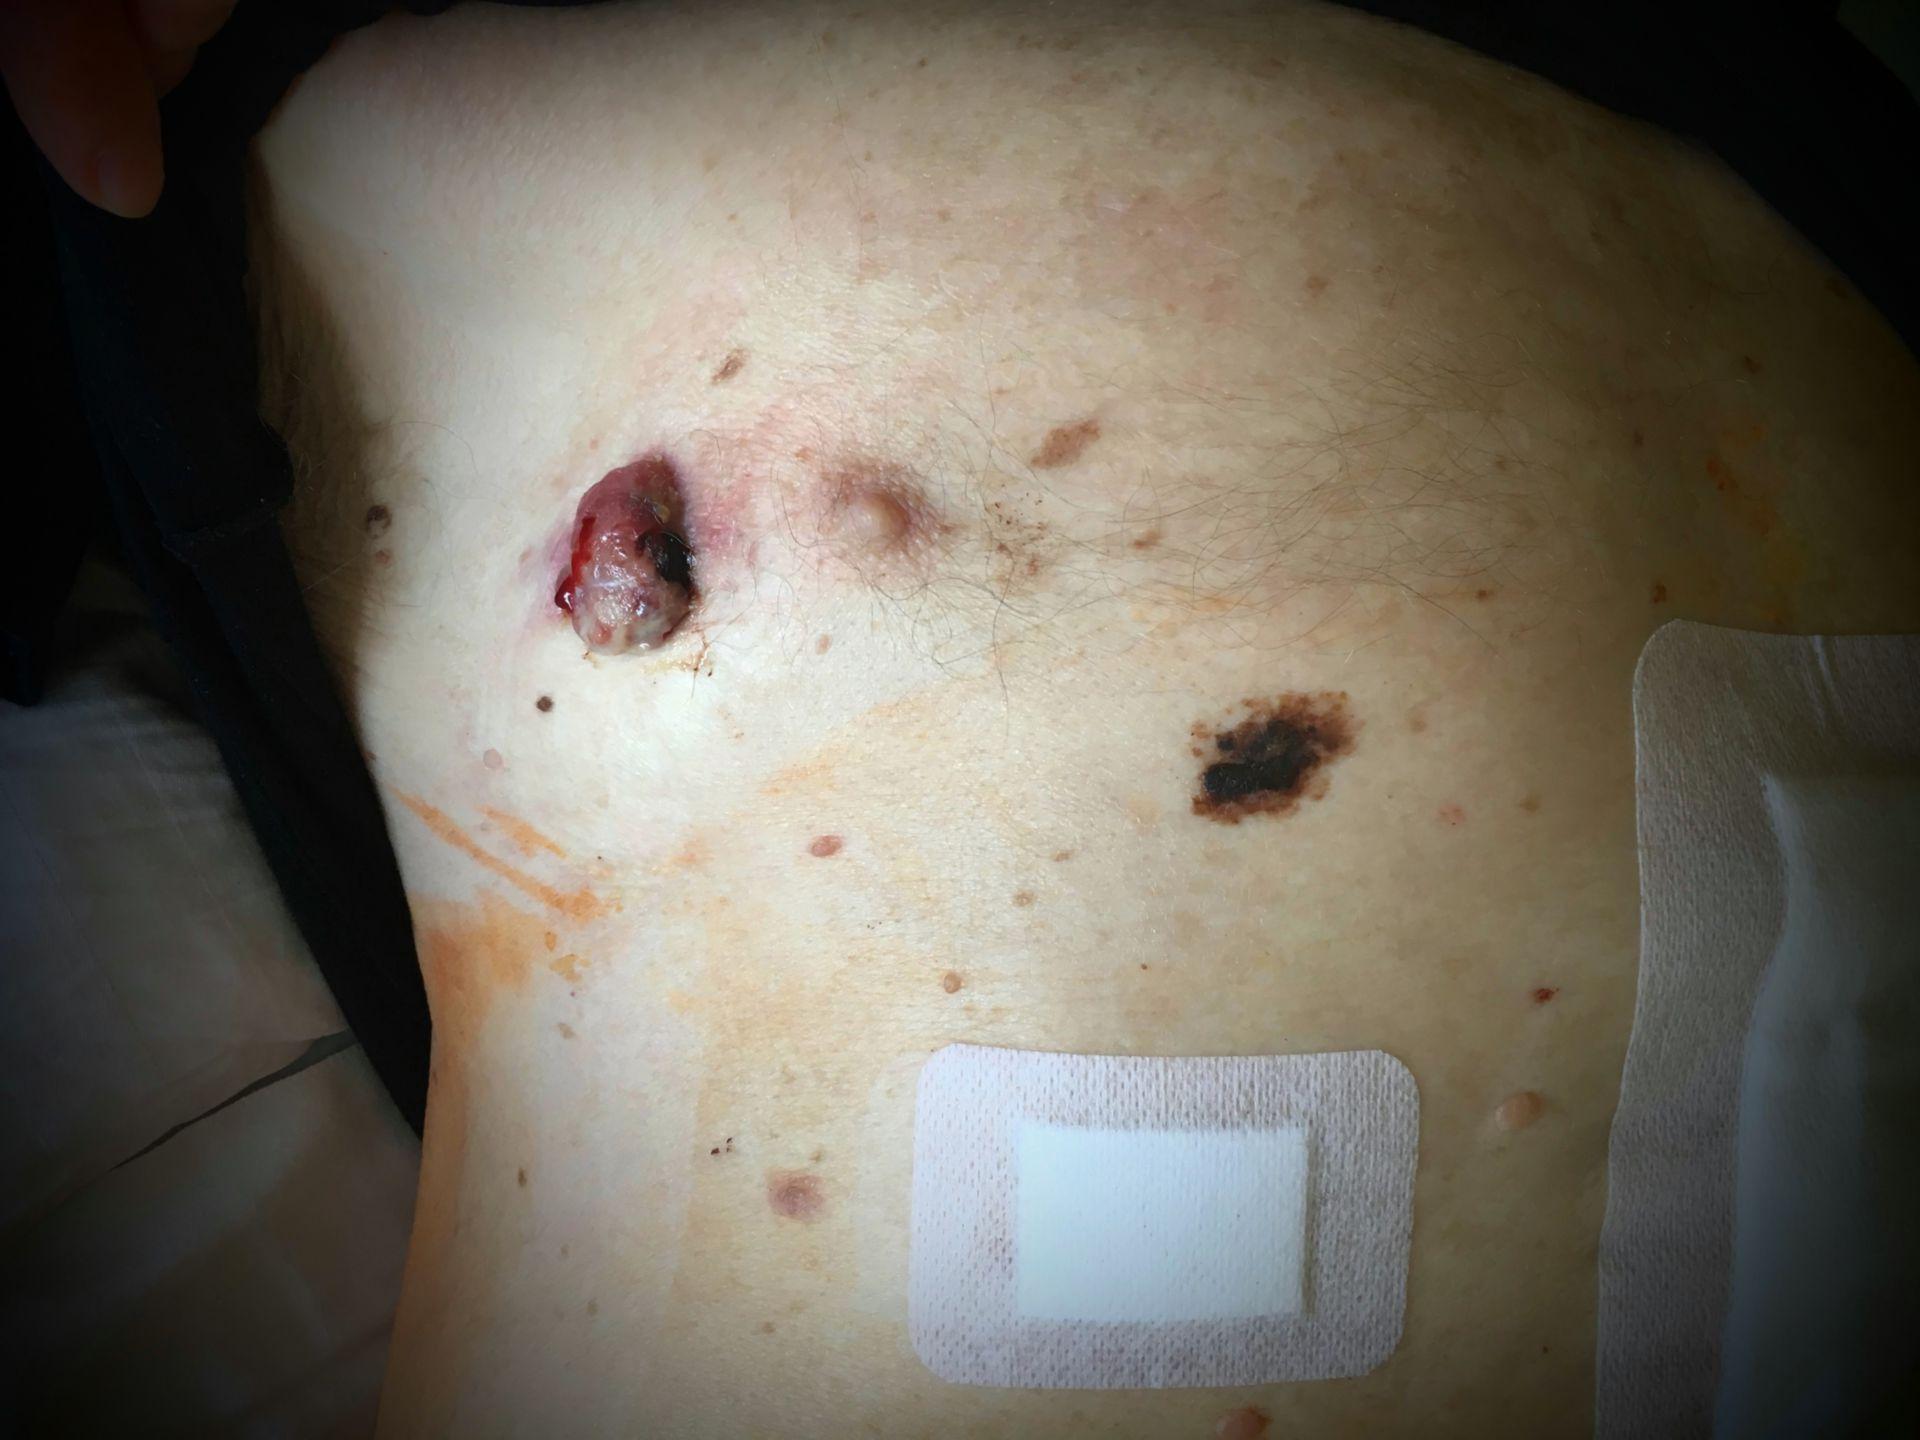 Malign melanoma with skin metastasis